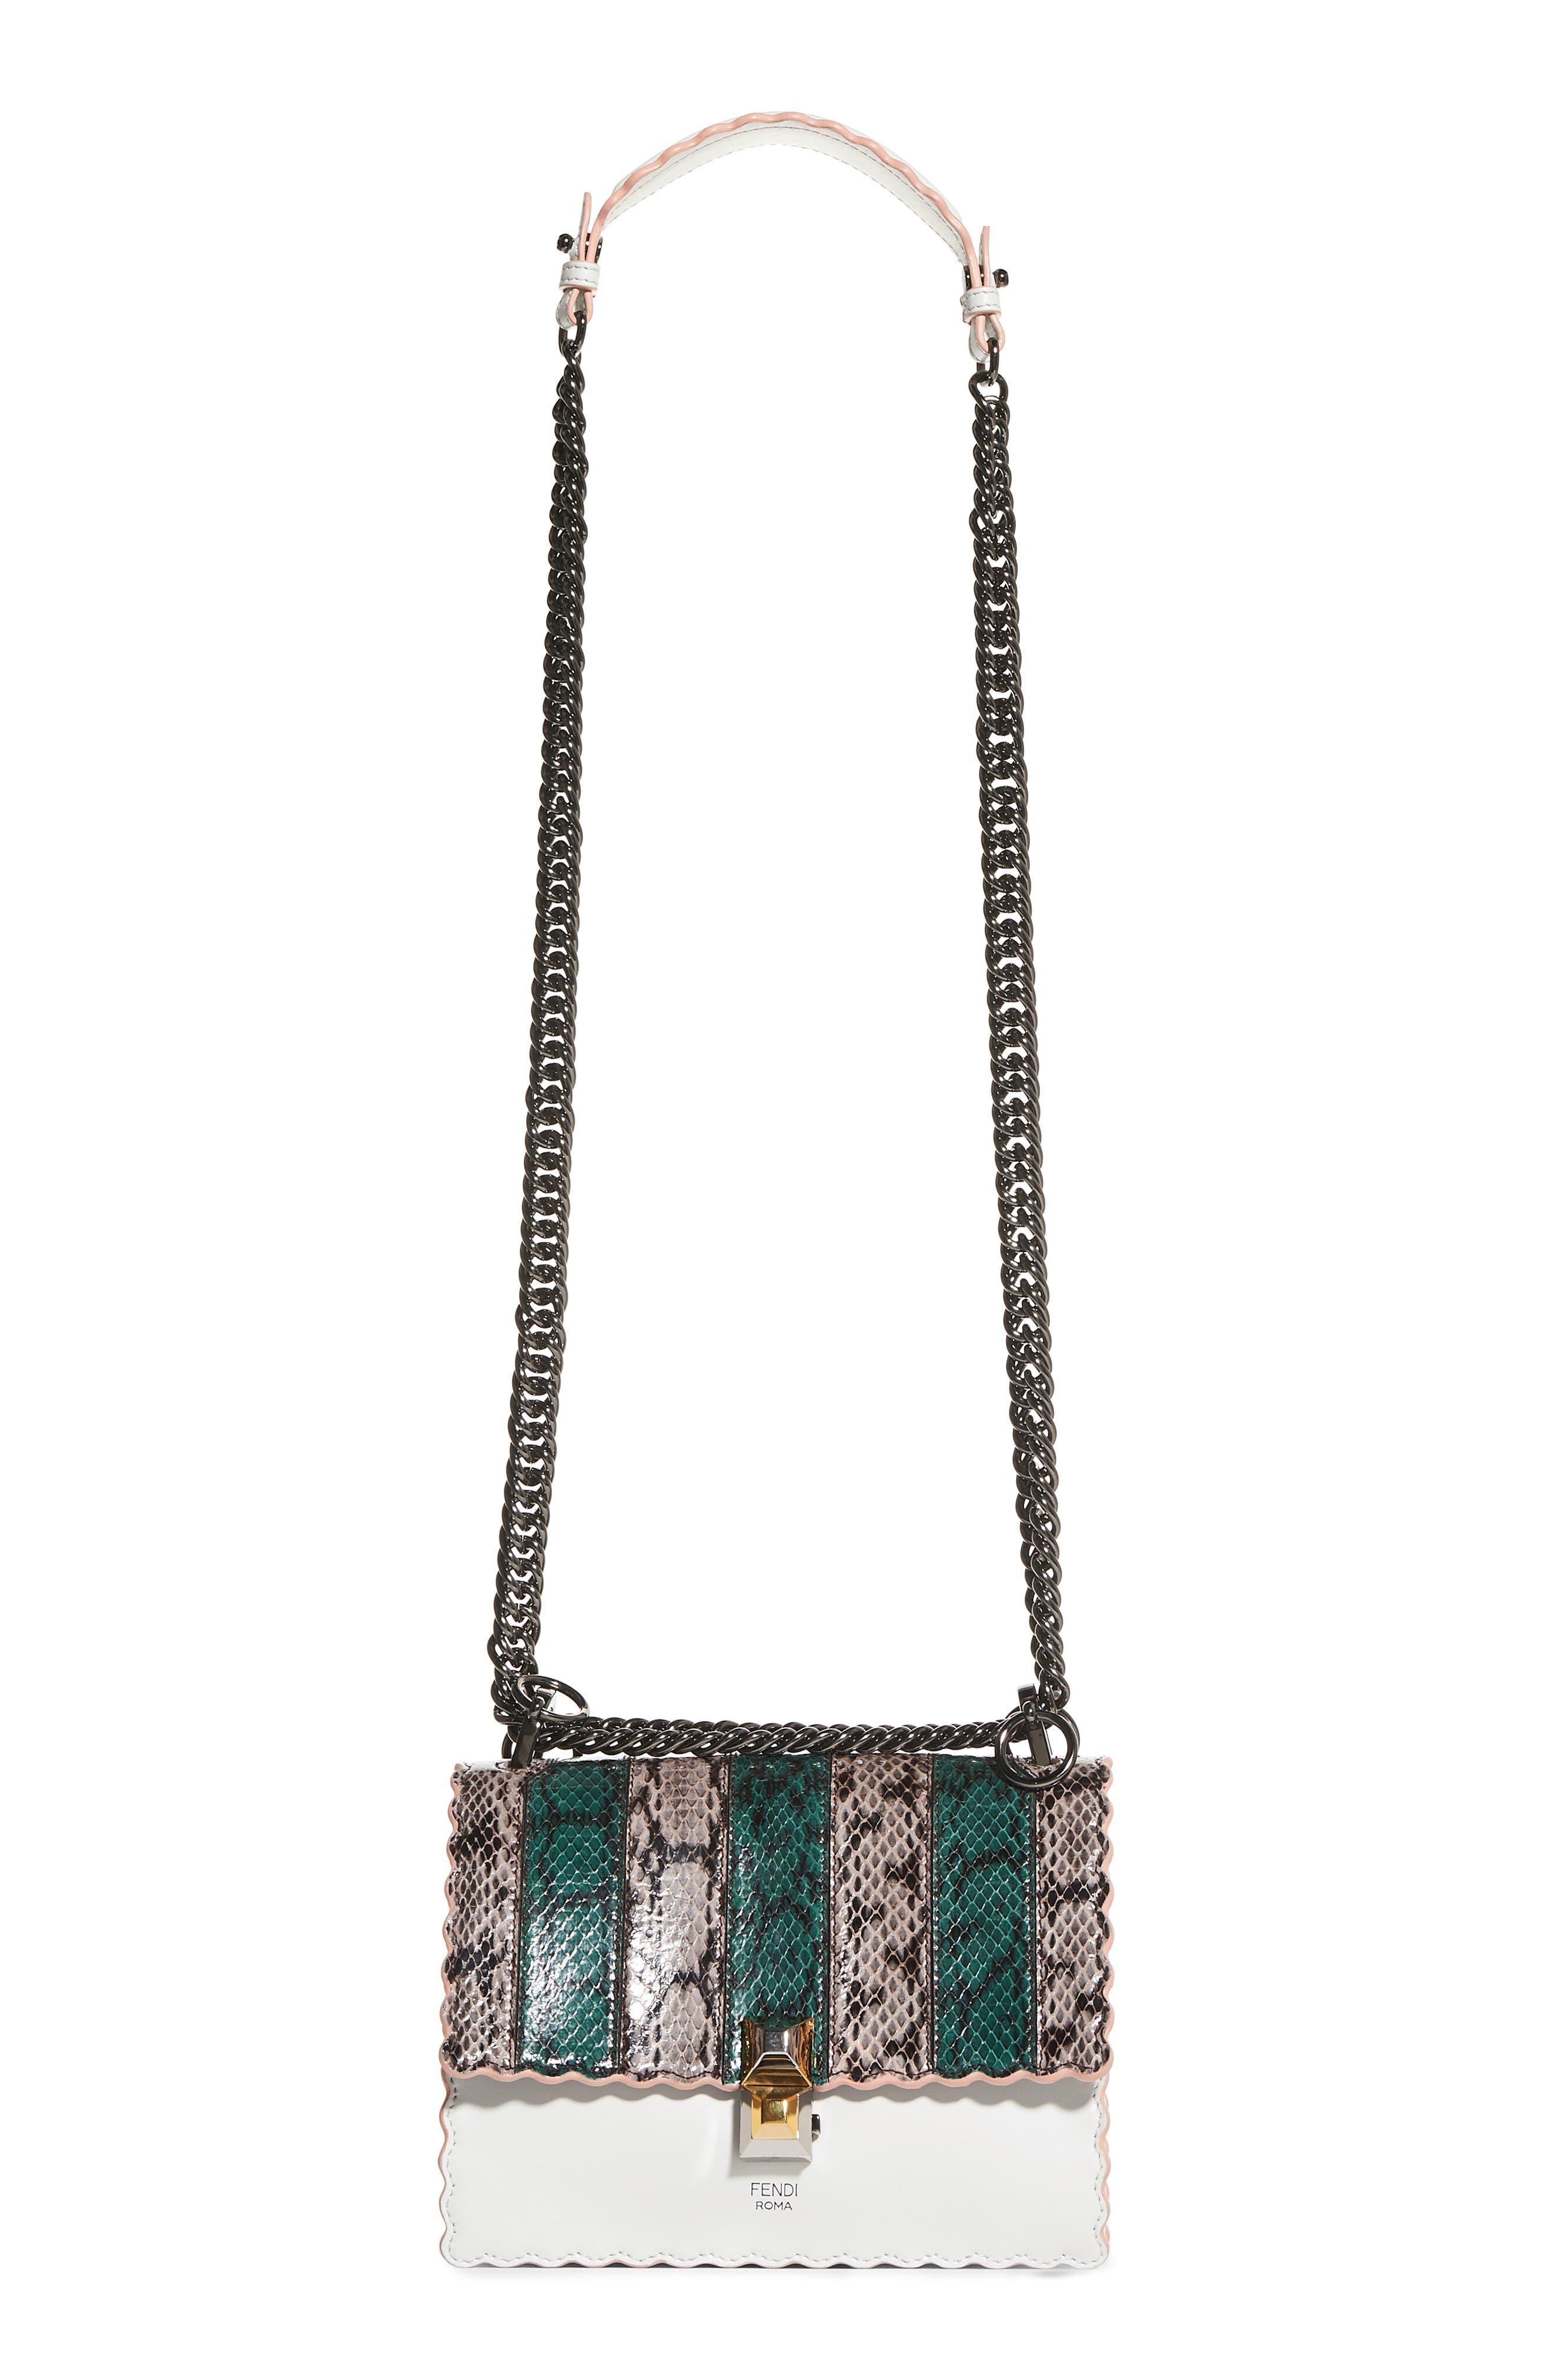 Mini Kan Scallop Genuine Snakeskin & Leather Shoulder Bag,                             Main thumbnail 1, color,                             TAUPE/ROMARO/WHITE